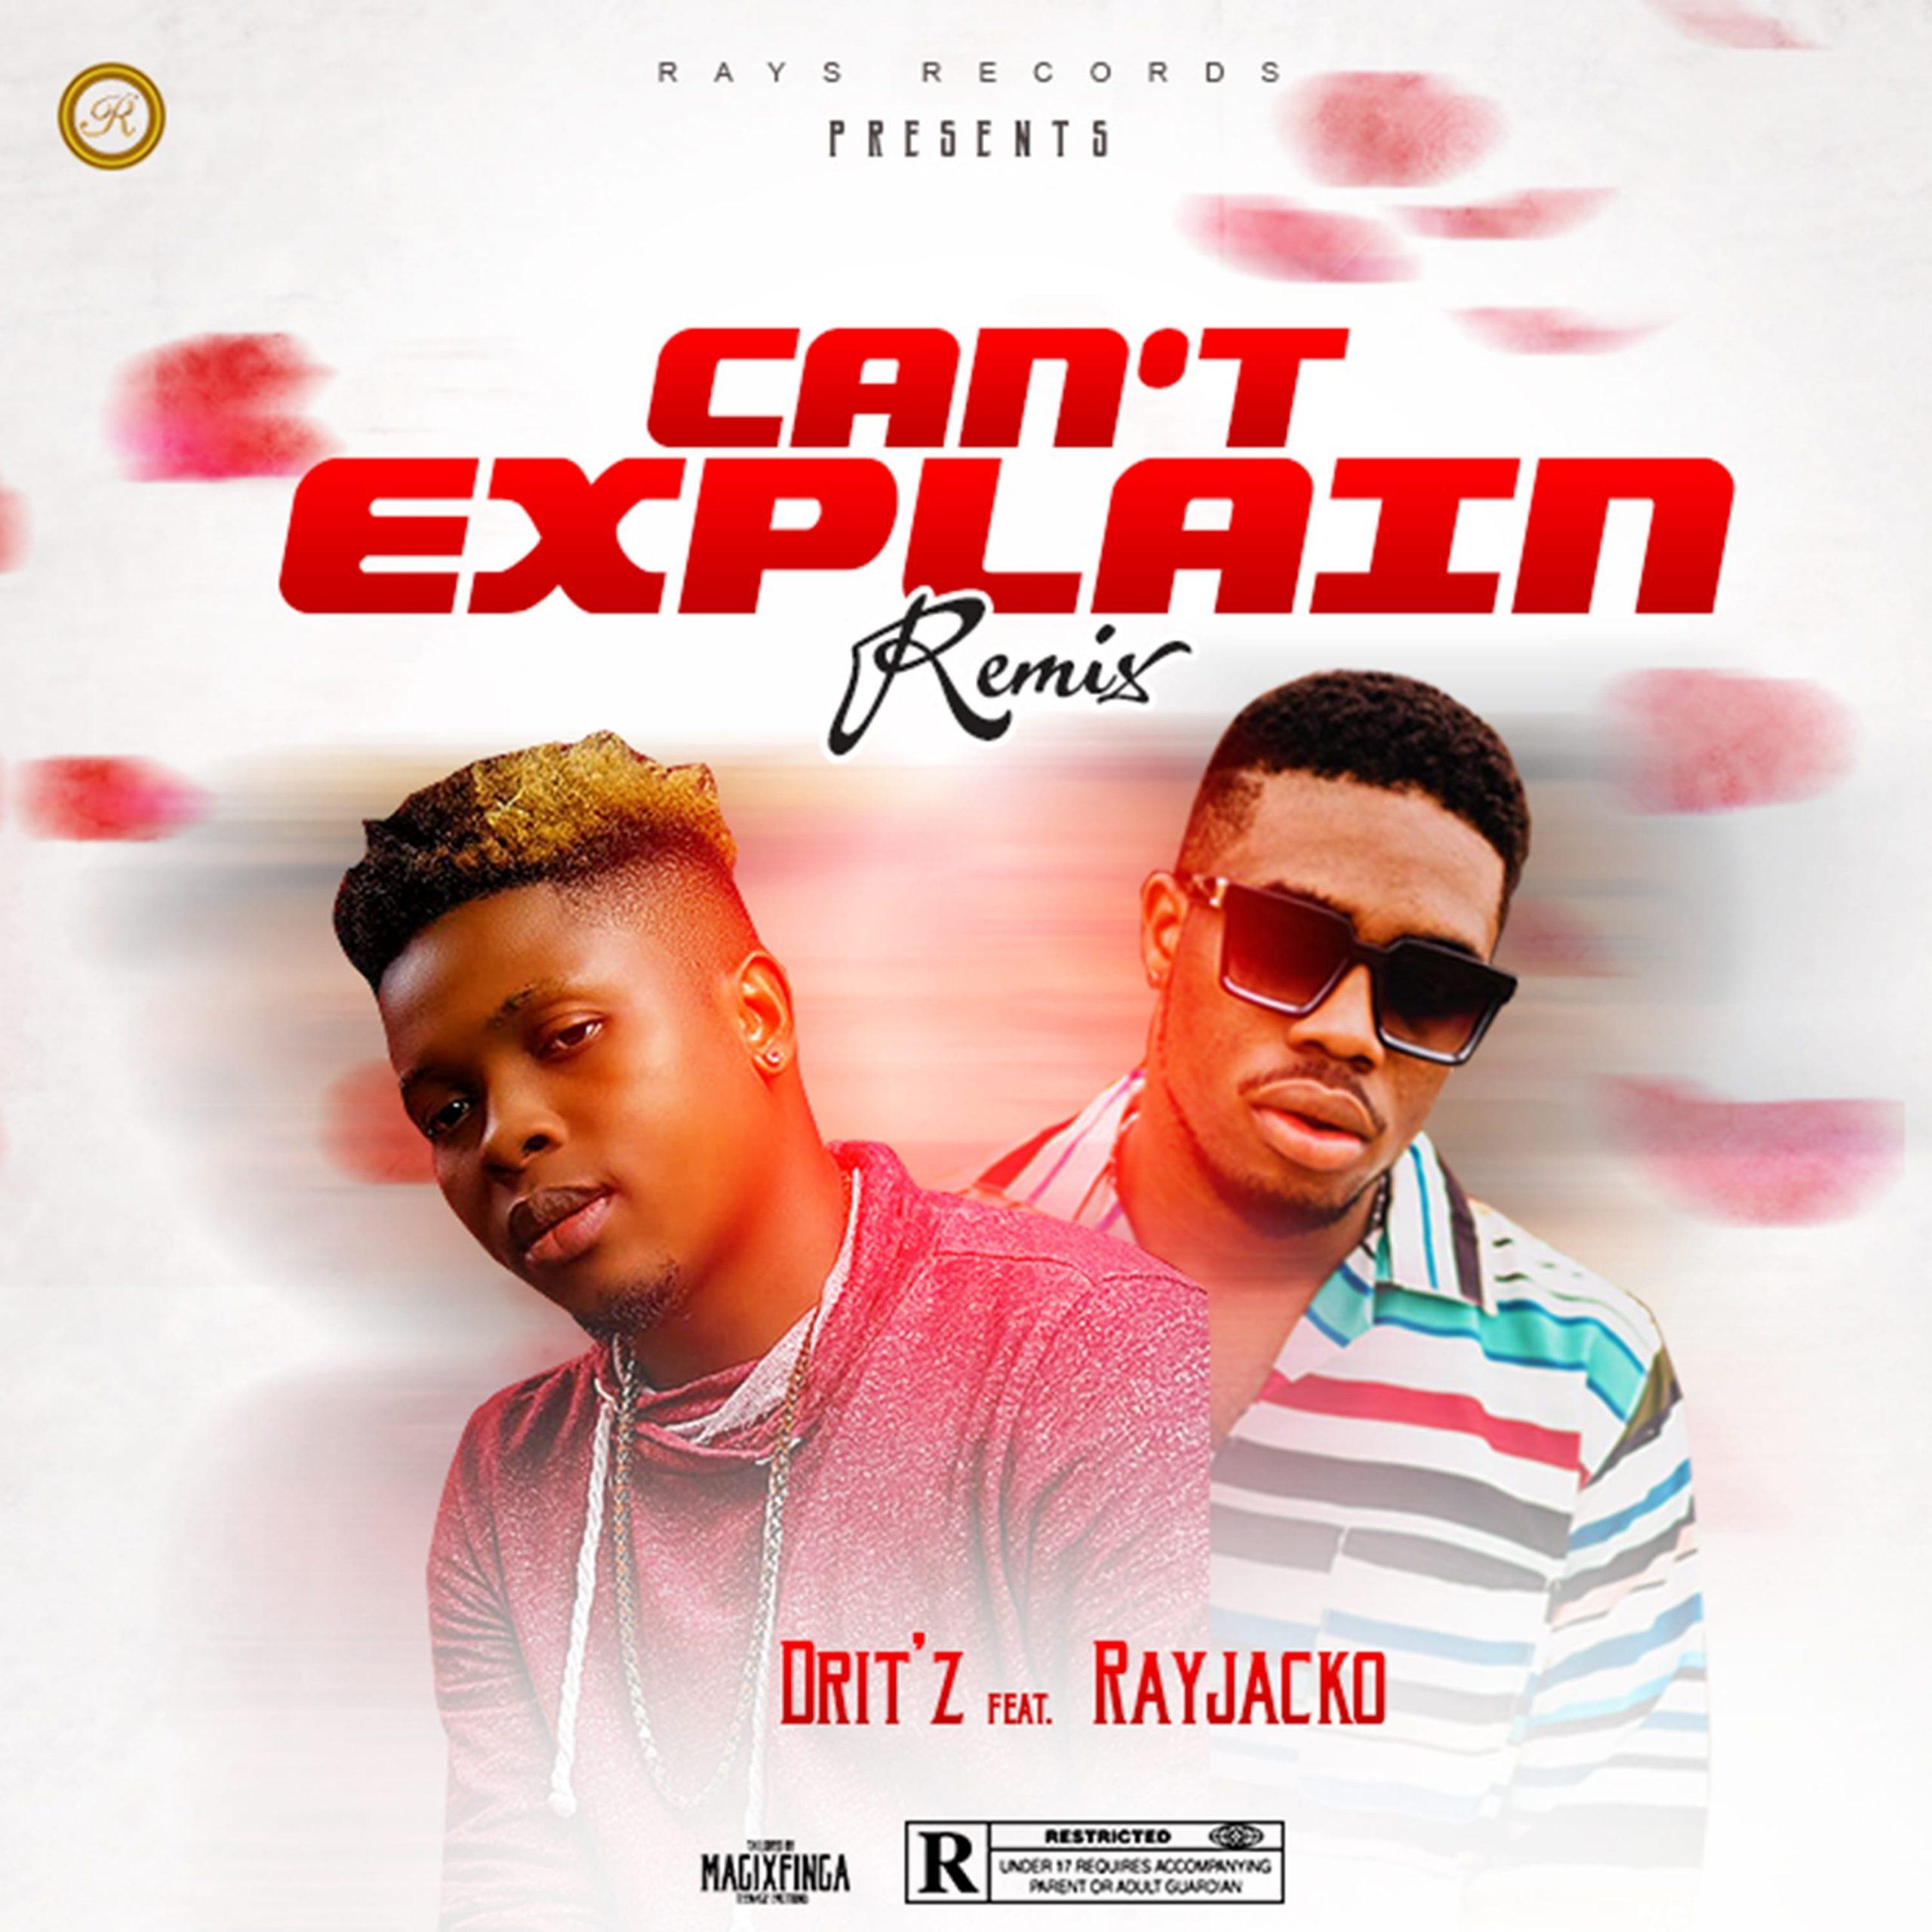 D'ritz Feat. Rayjacko – Can't Explain (Remix)